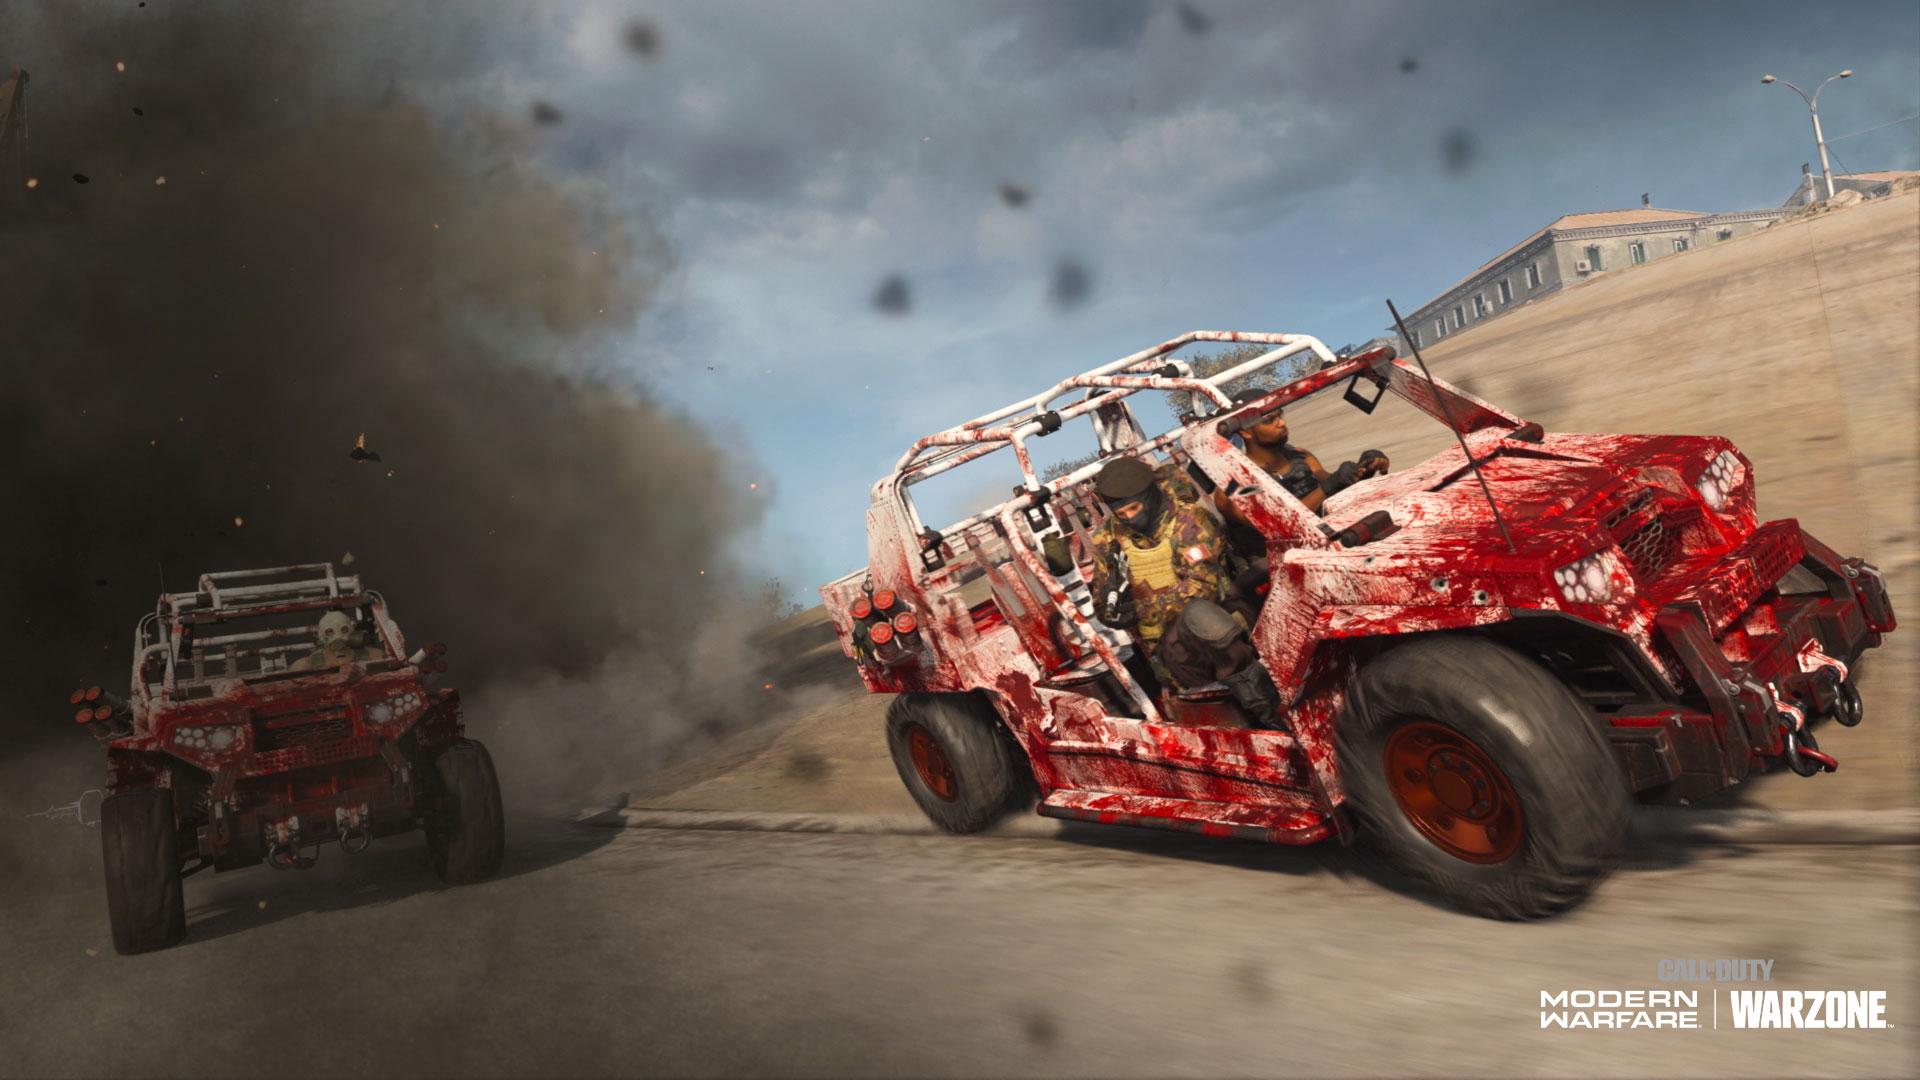 Call of Duty Halloween truck skin